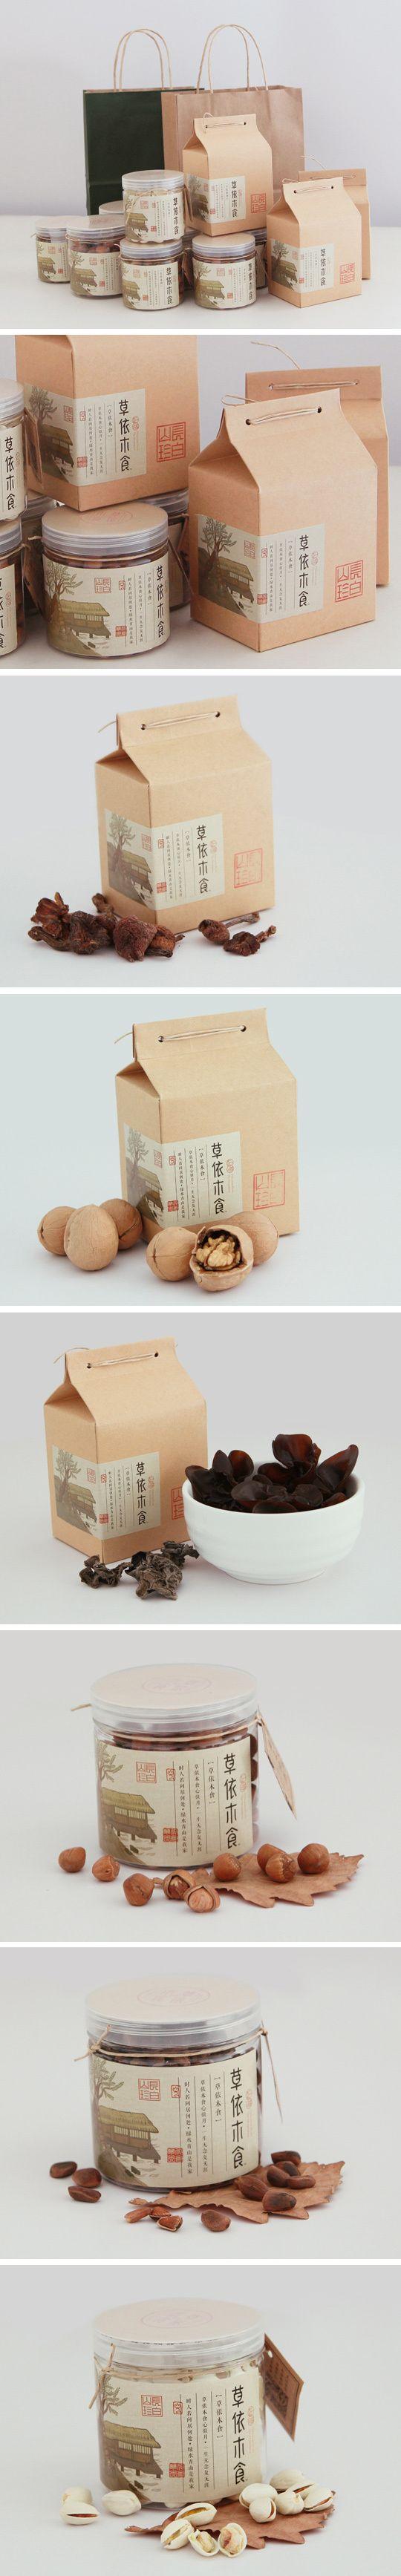 草依木食商标设计/中文标志设计/干果包装... Delicacies From The Mountains PD